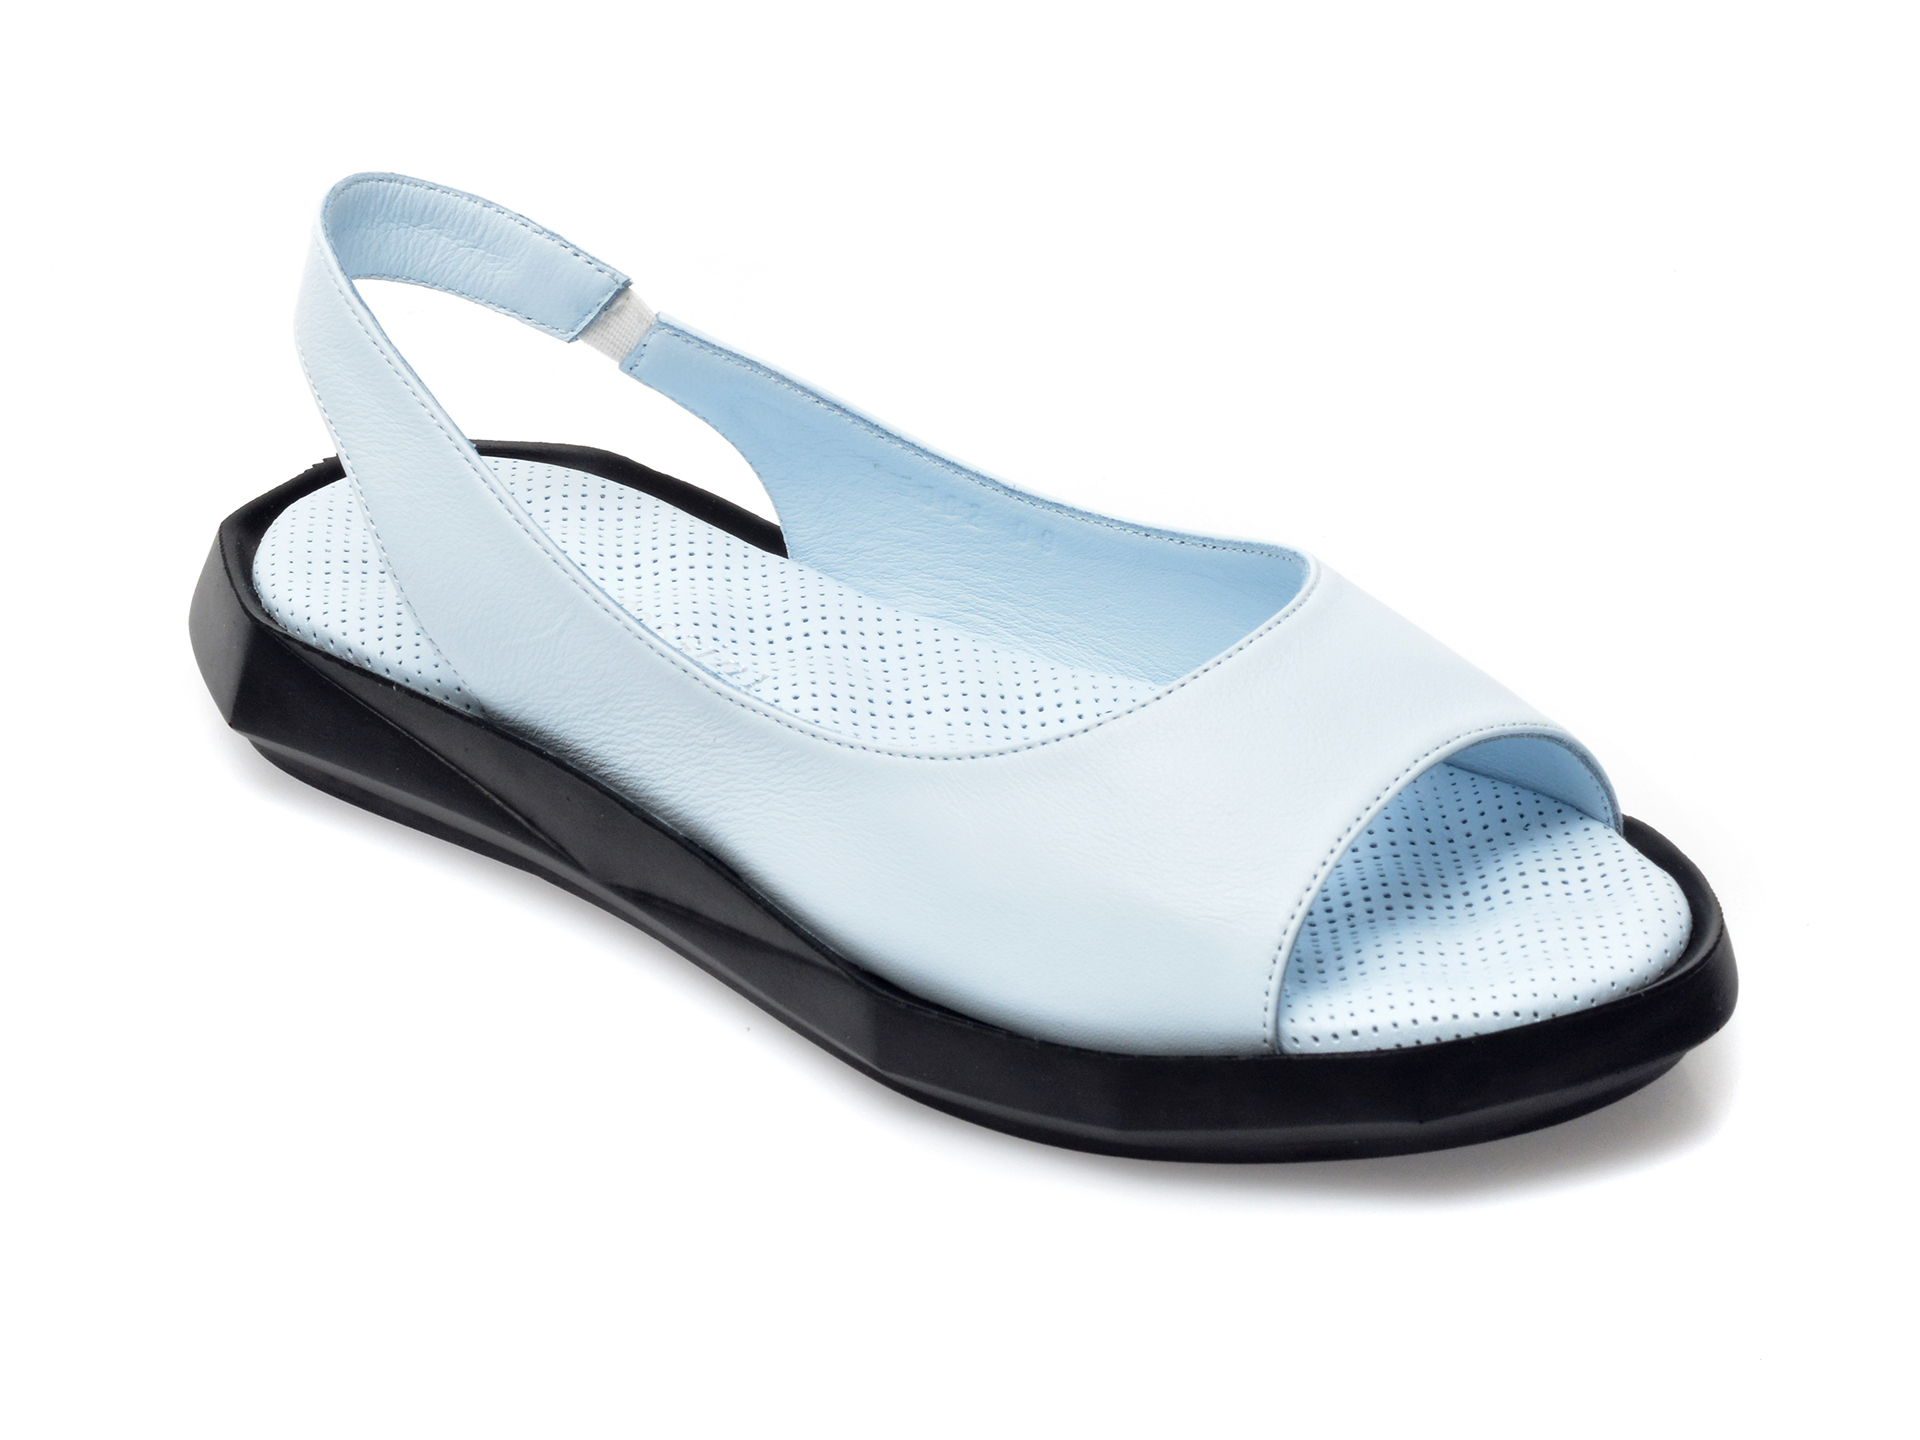 Sandale FLAVIA PASSINI albastre, 705002, din piele naturala imagine otter.ro 2021